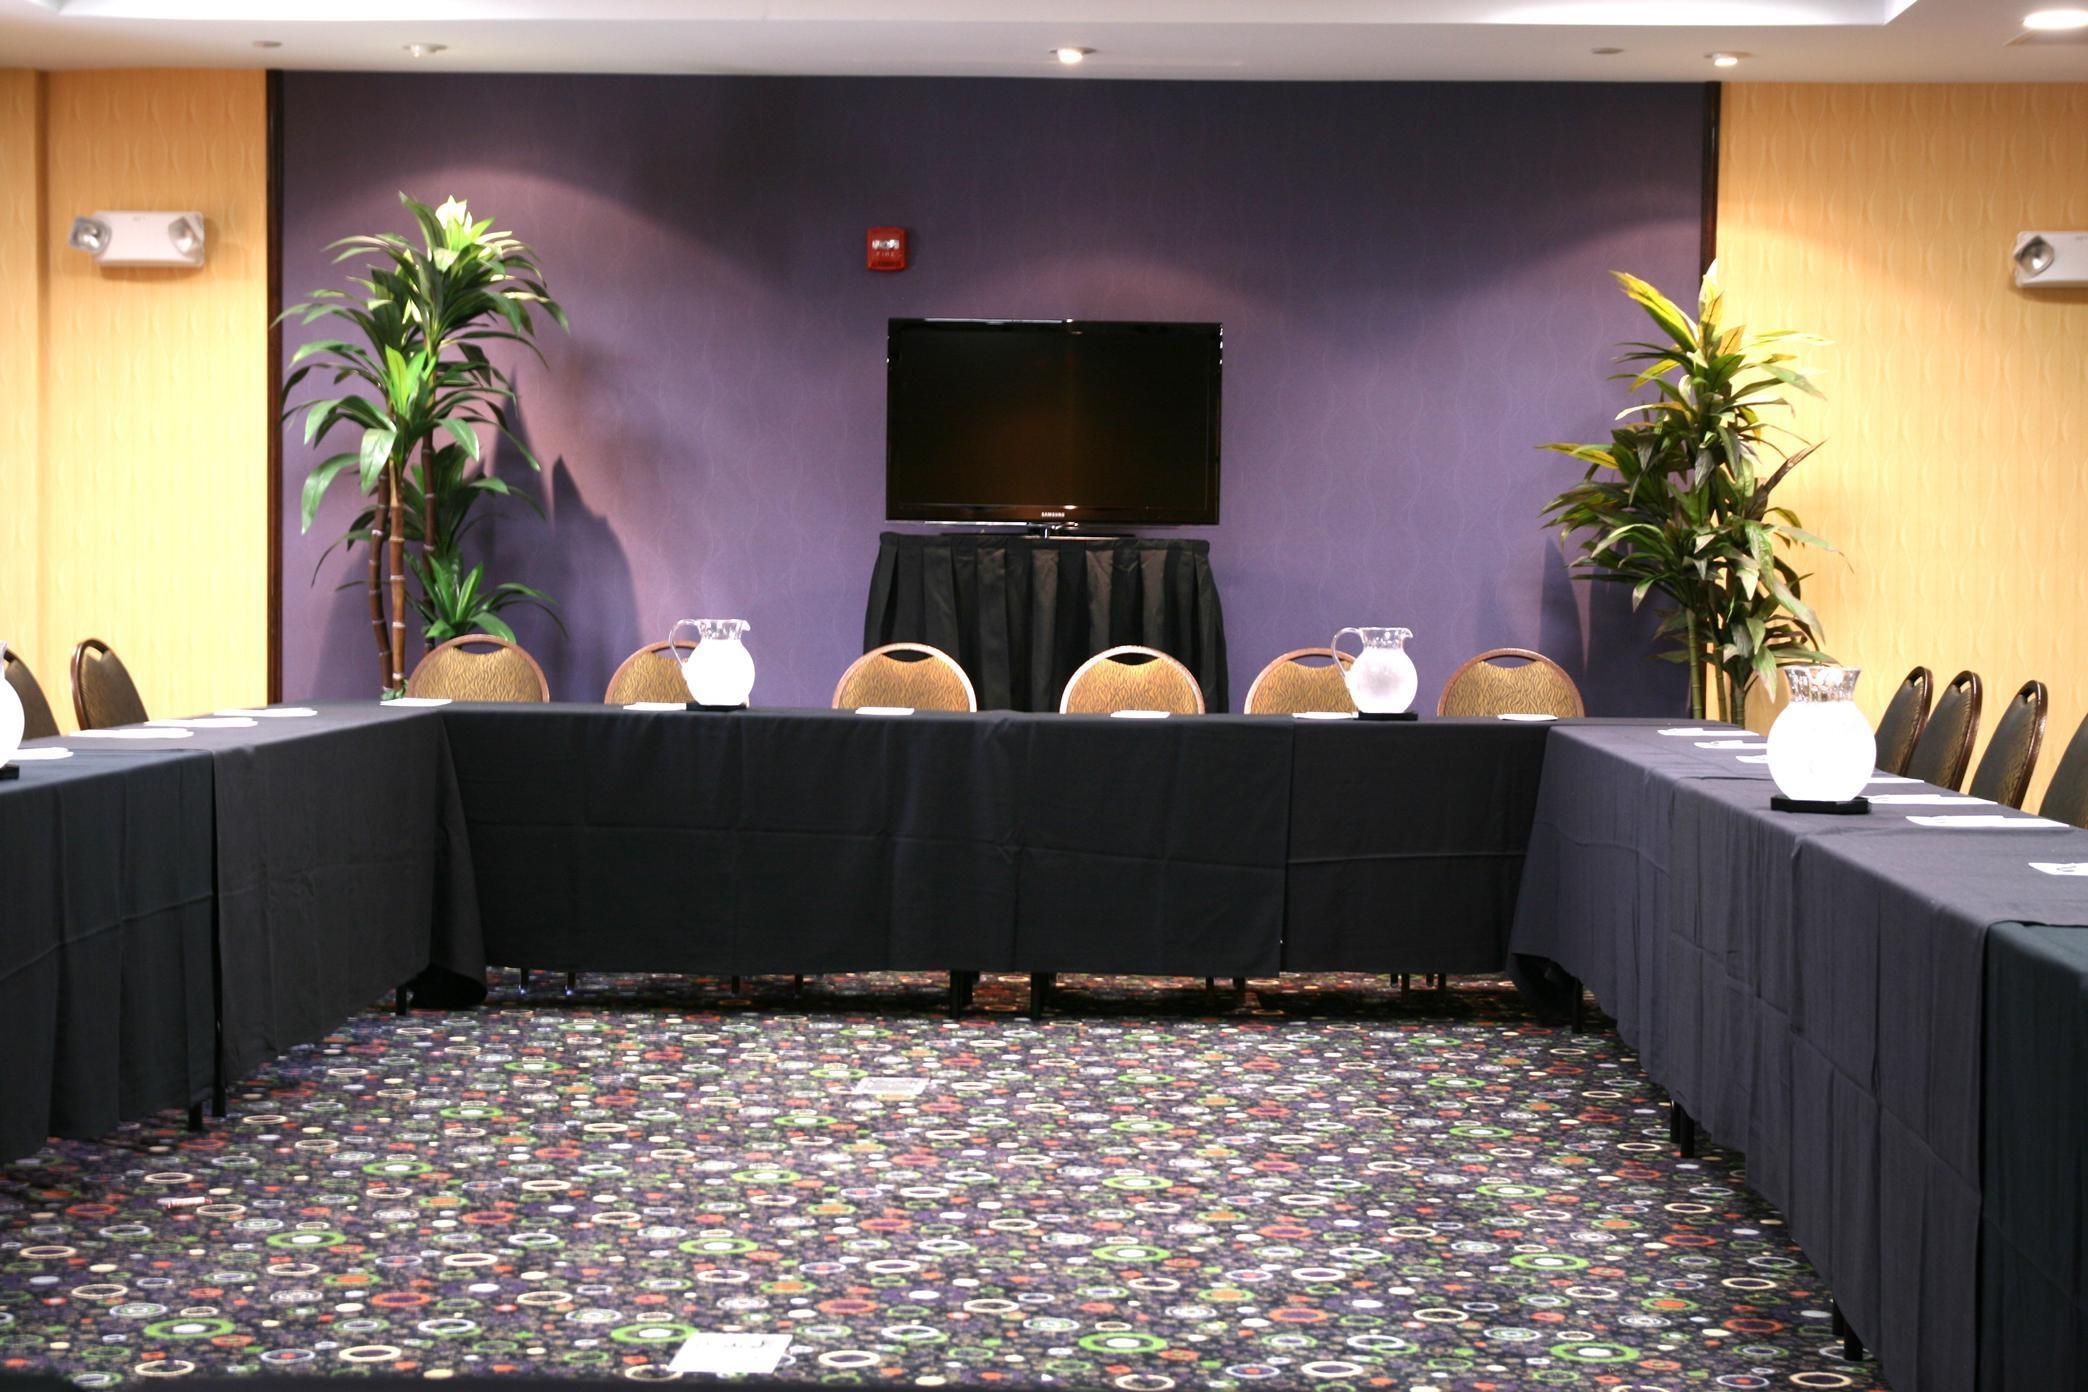 Hampton Inn & Suites Dallas/Lewisville-Vista Ridge Mall, TX image 27